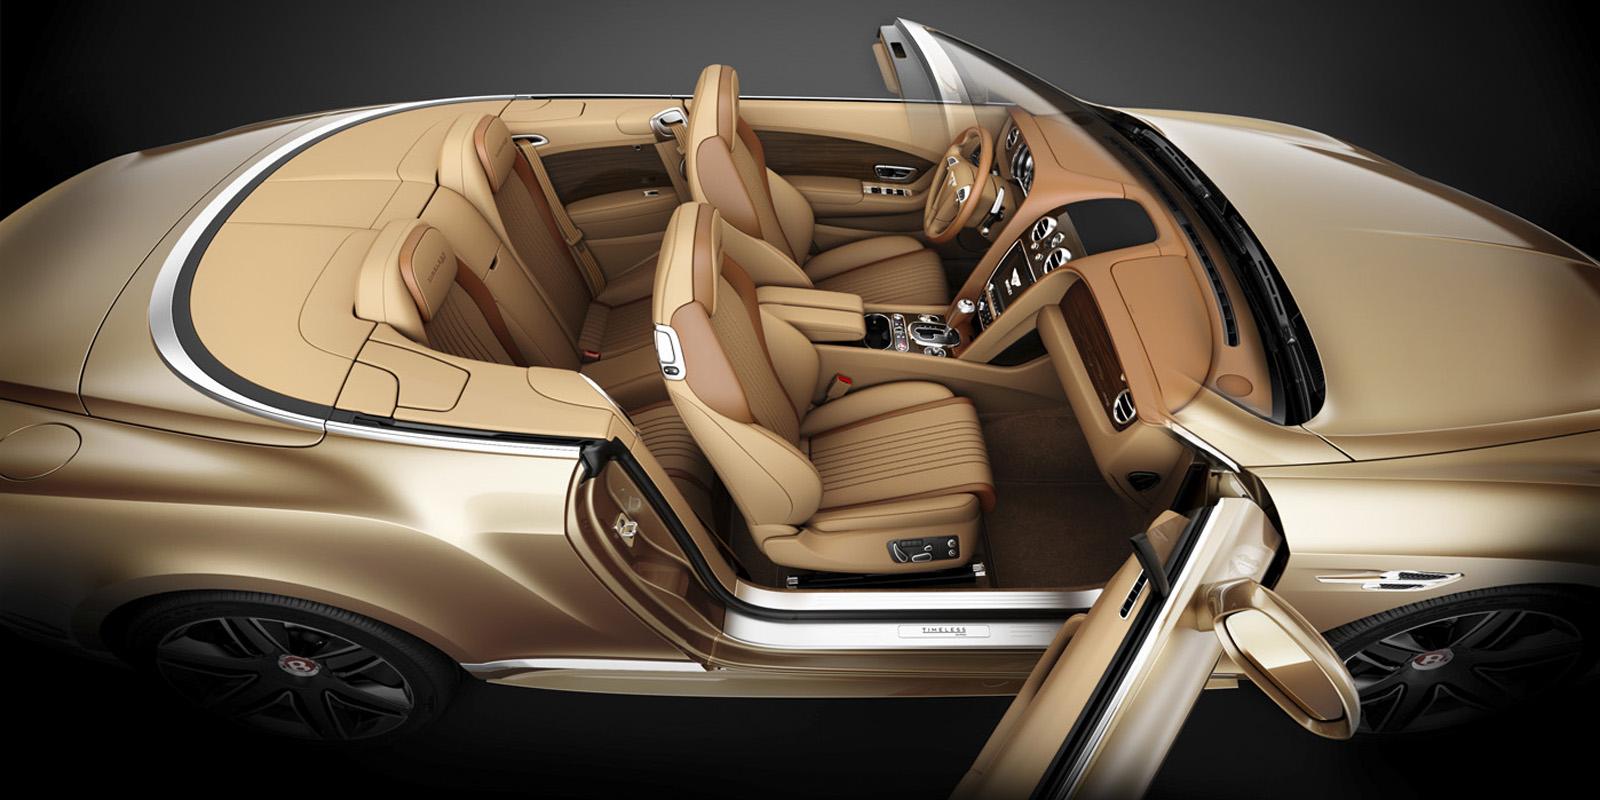 Bentley_Continental_GTC_Timeless_Series_02